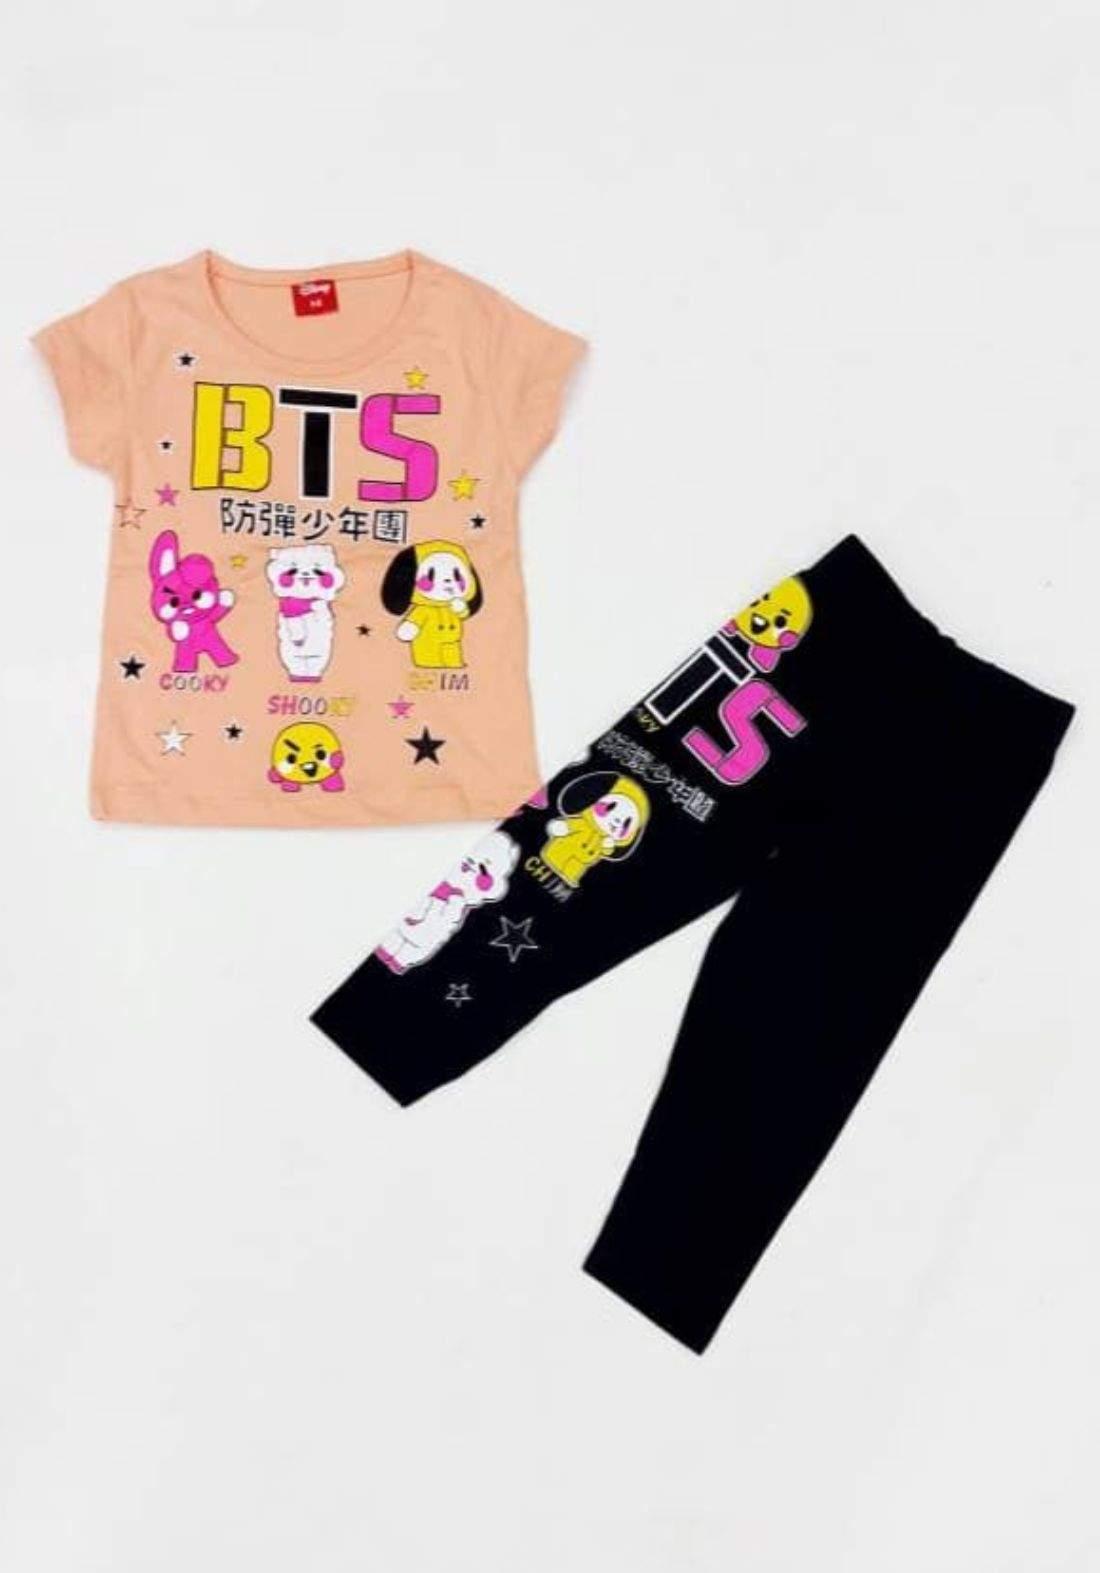 Tracksuit for girls orange (t-shirt+pijamas) تراكسوت بناتي برتقالي (بجامة+تيشيرت)